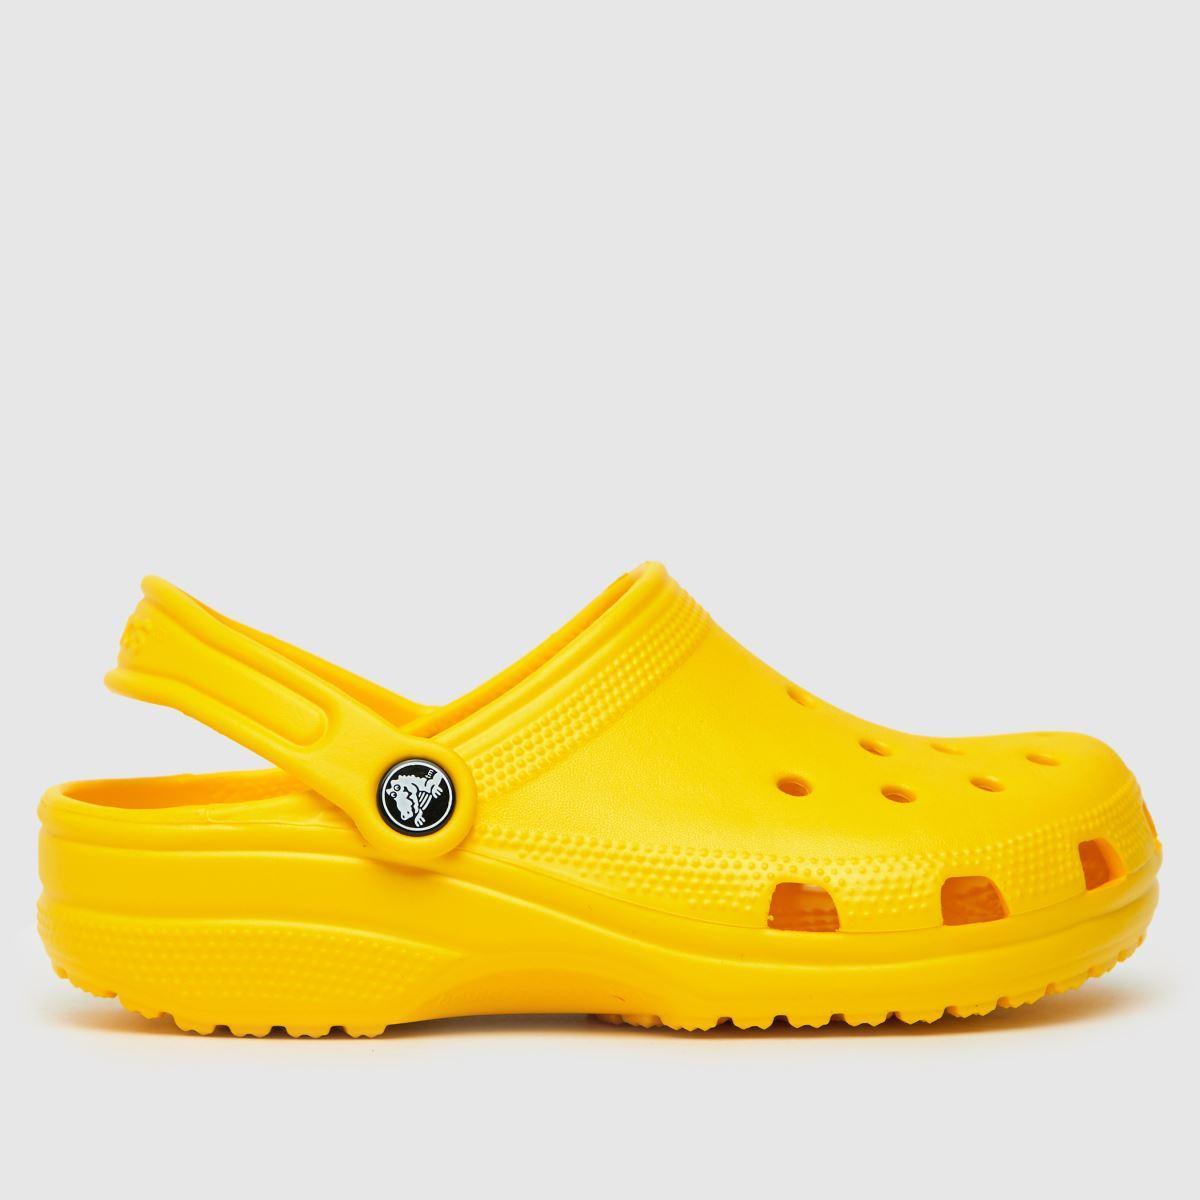 Crocs Yellow Classic Clog Trainers Junior